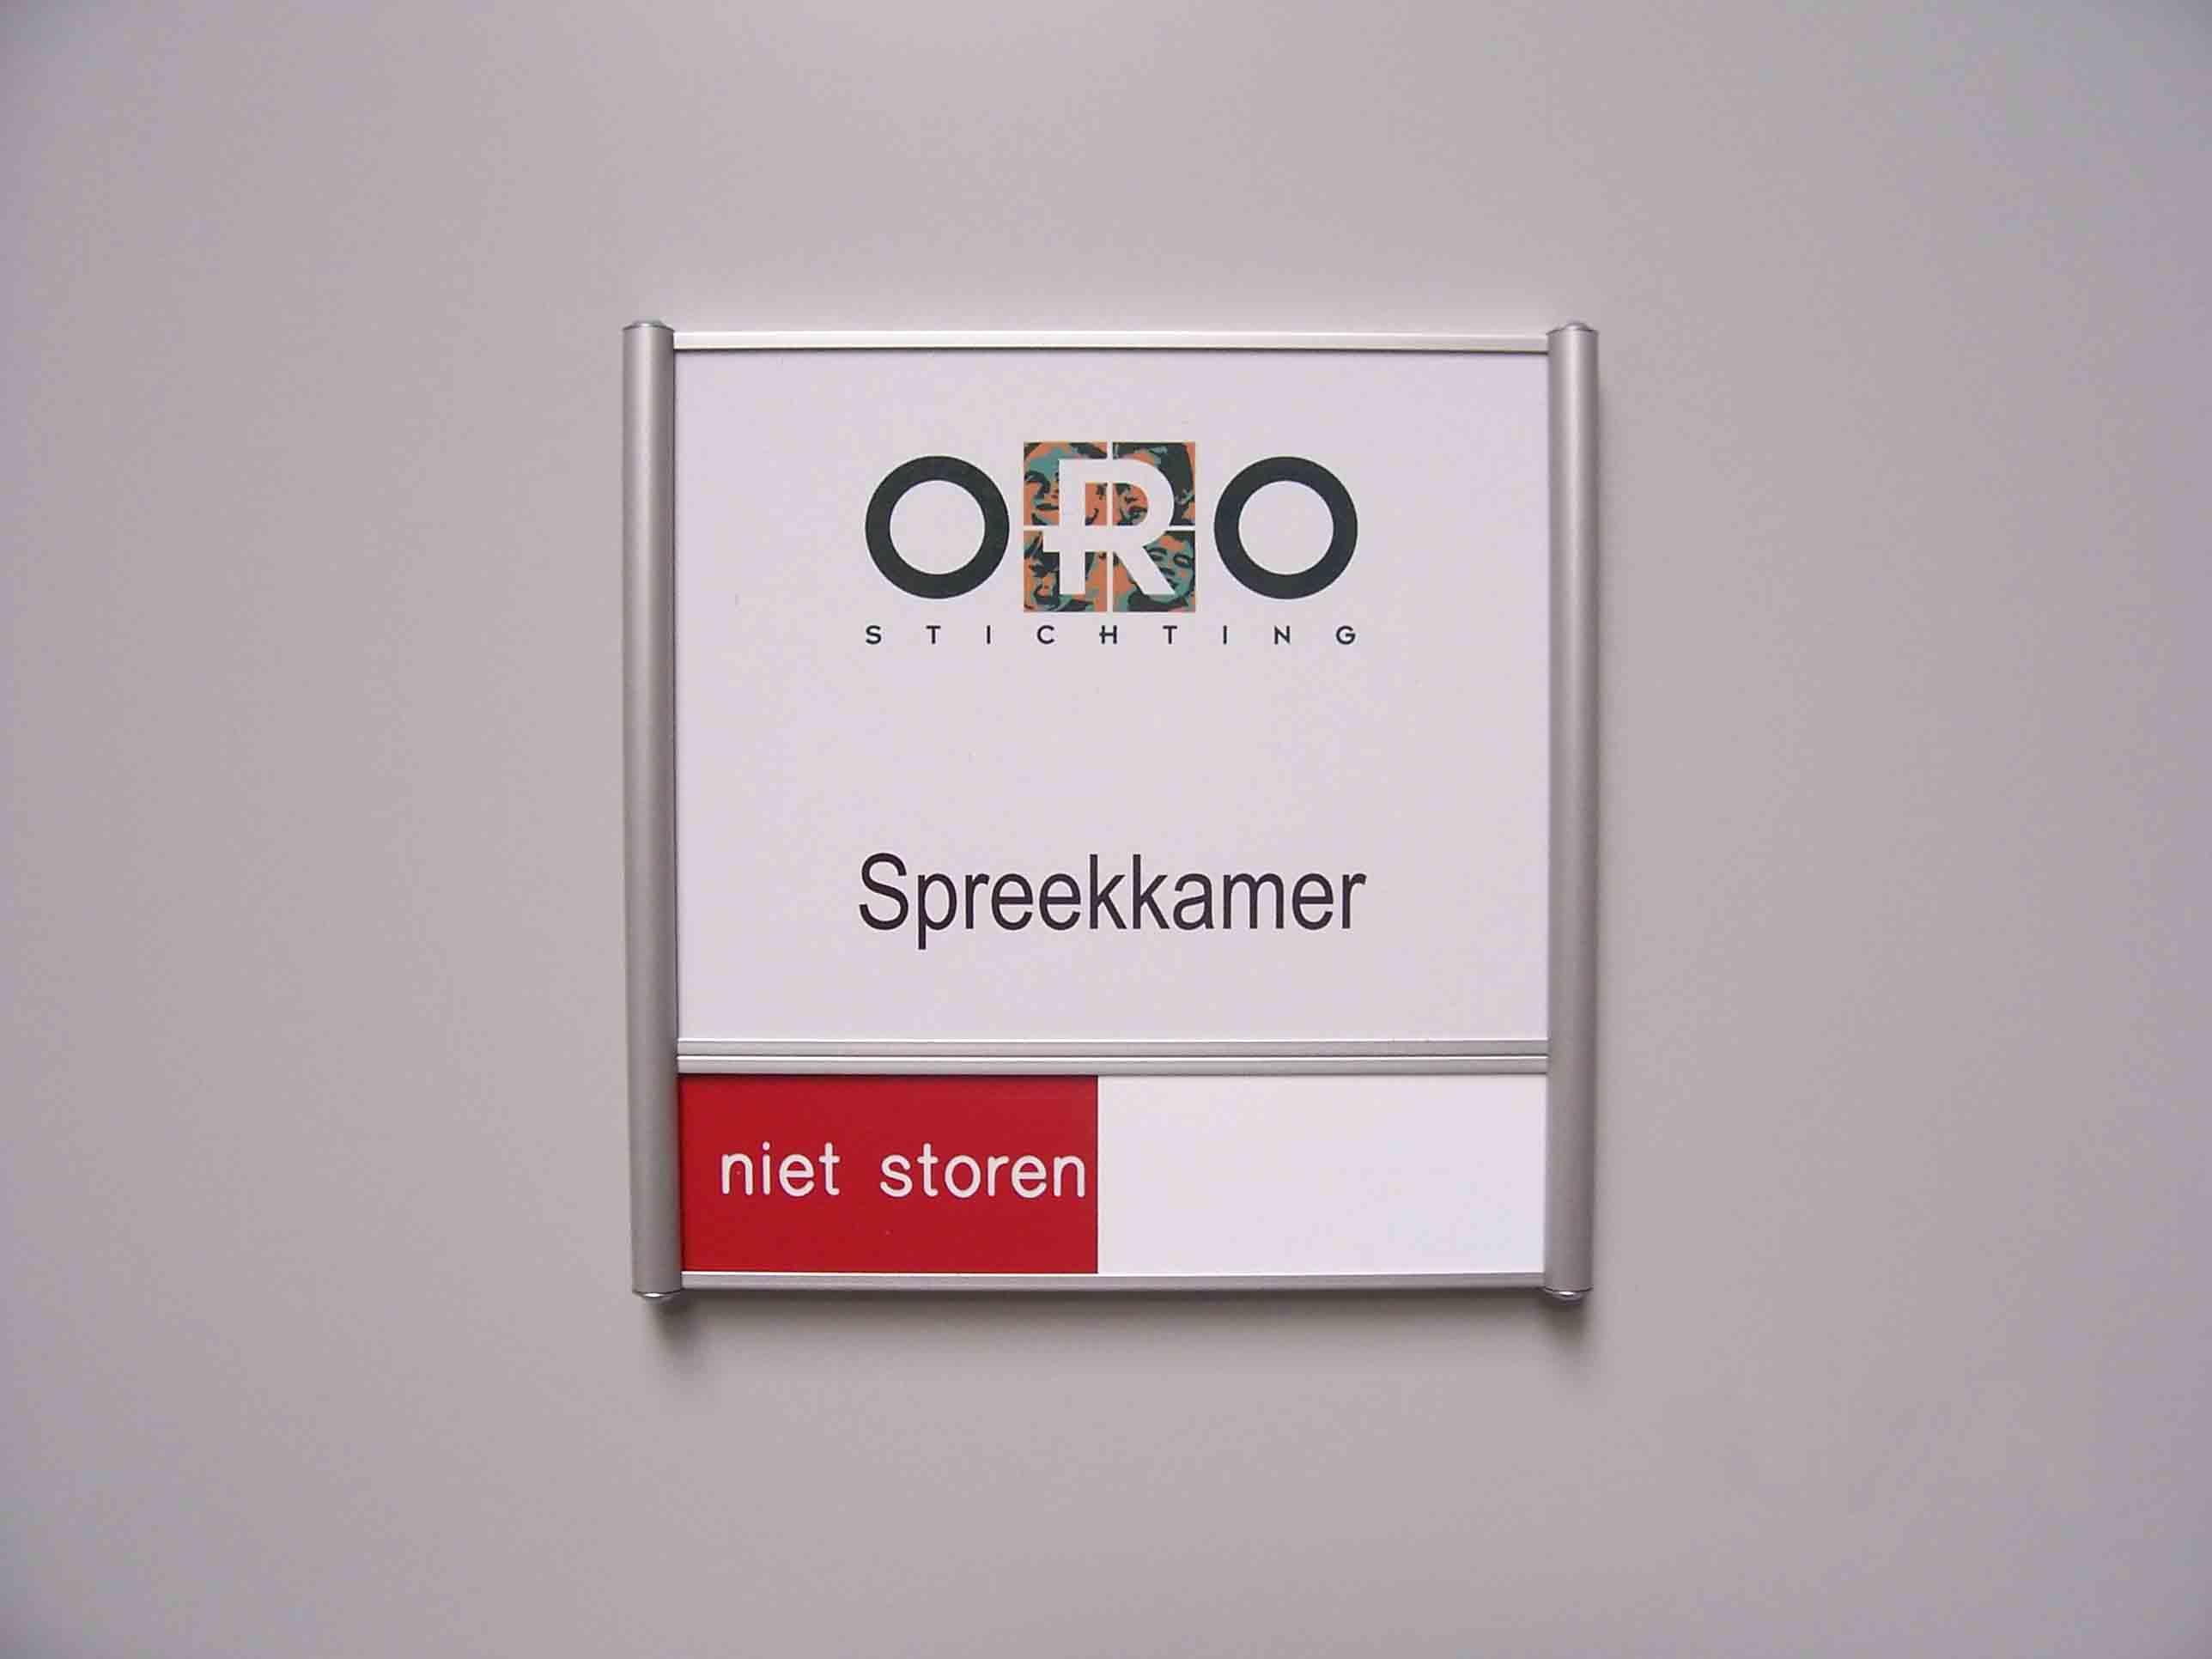 Stichting ORO